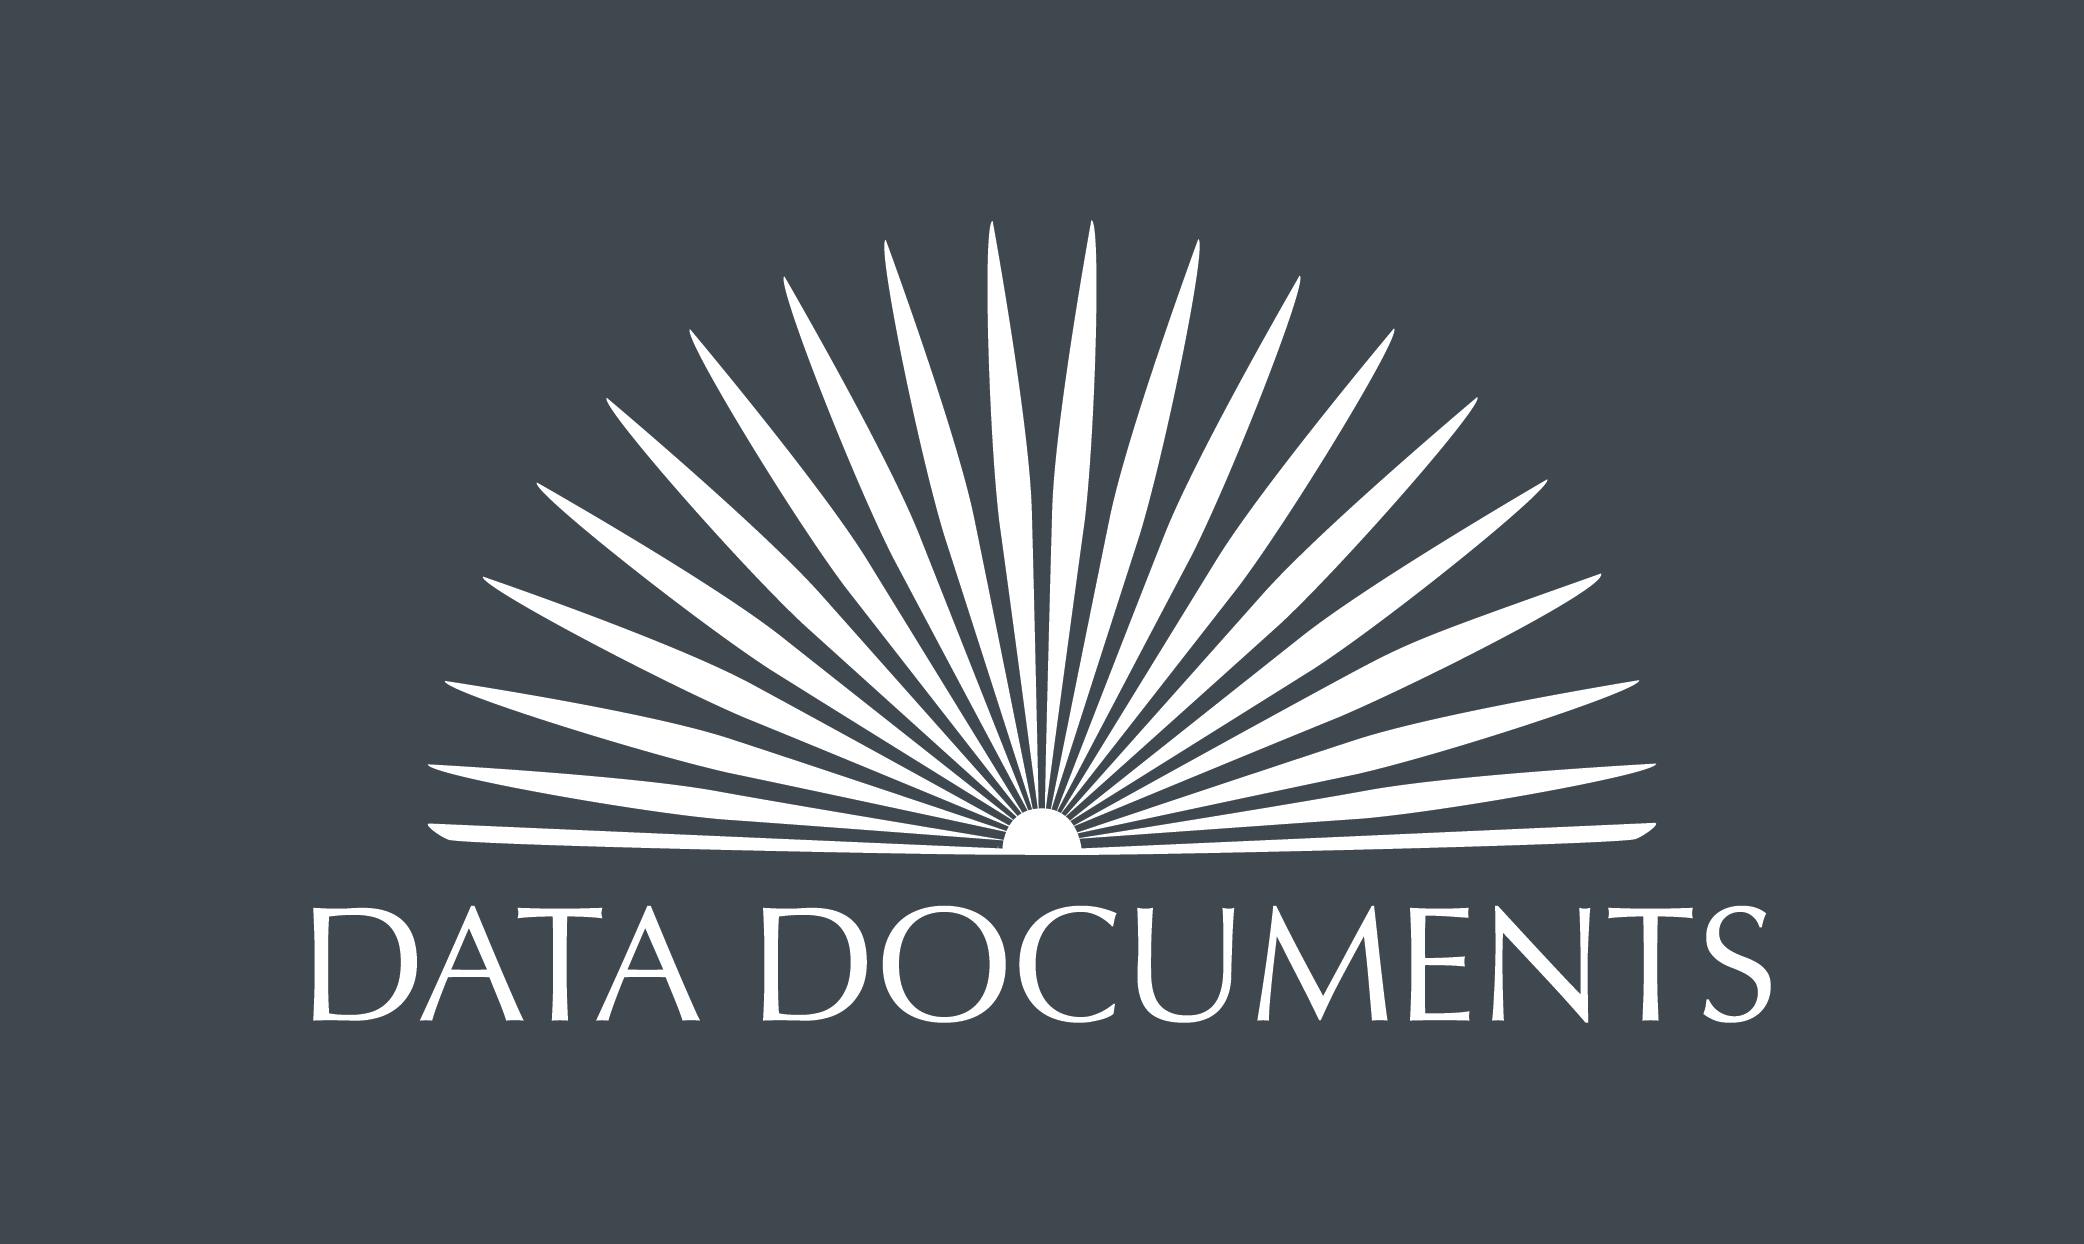 DATA DOCUMENTS LOGO_MAIN LOGO NO TAGLINE_MAIN LOGO NO TAGLINE.png